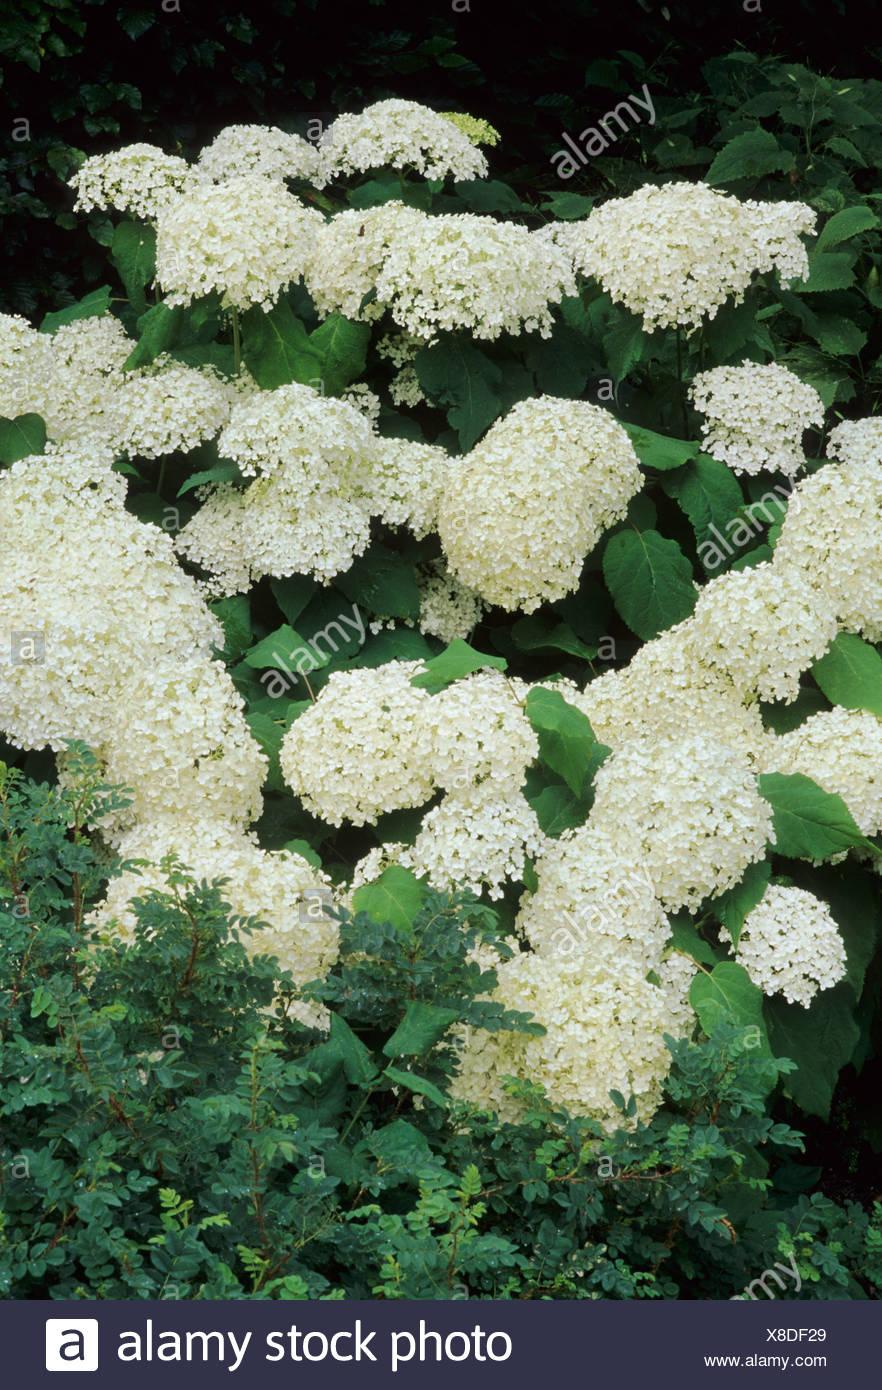 Hydrangea Arborescens Annabelle White Flower Flowers Garden Plant